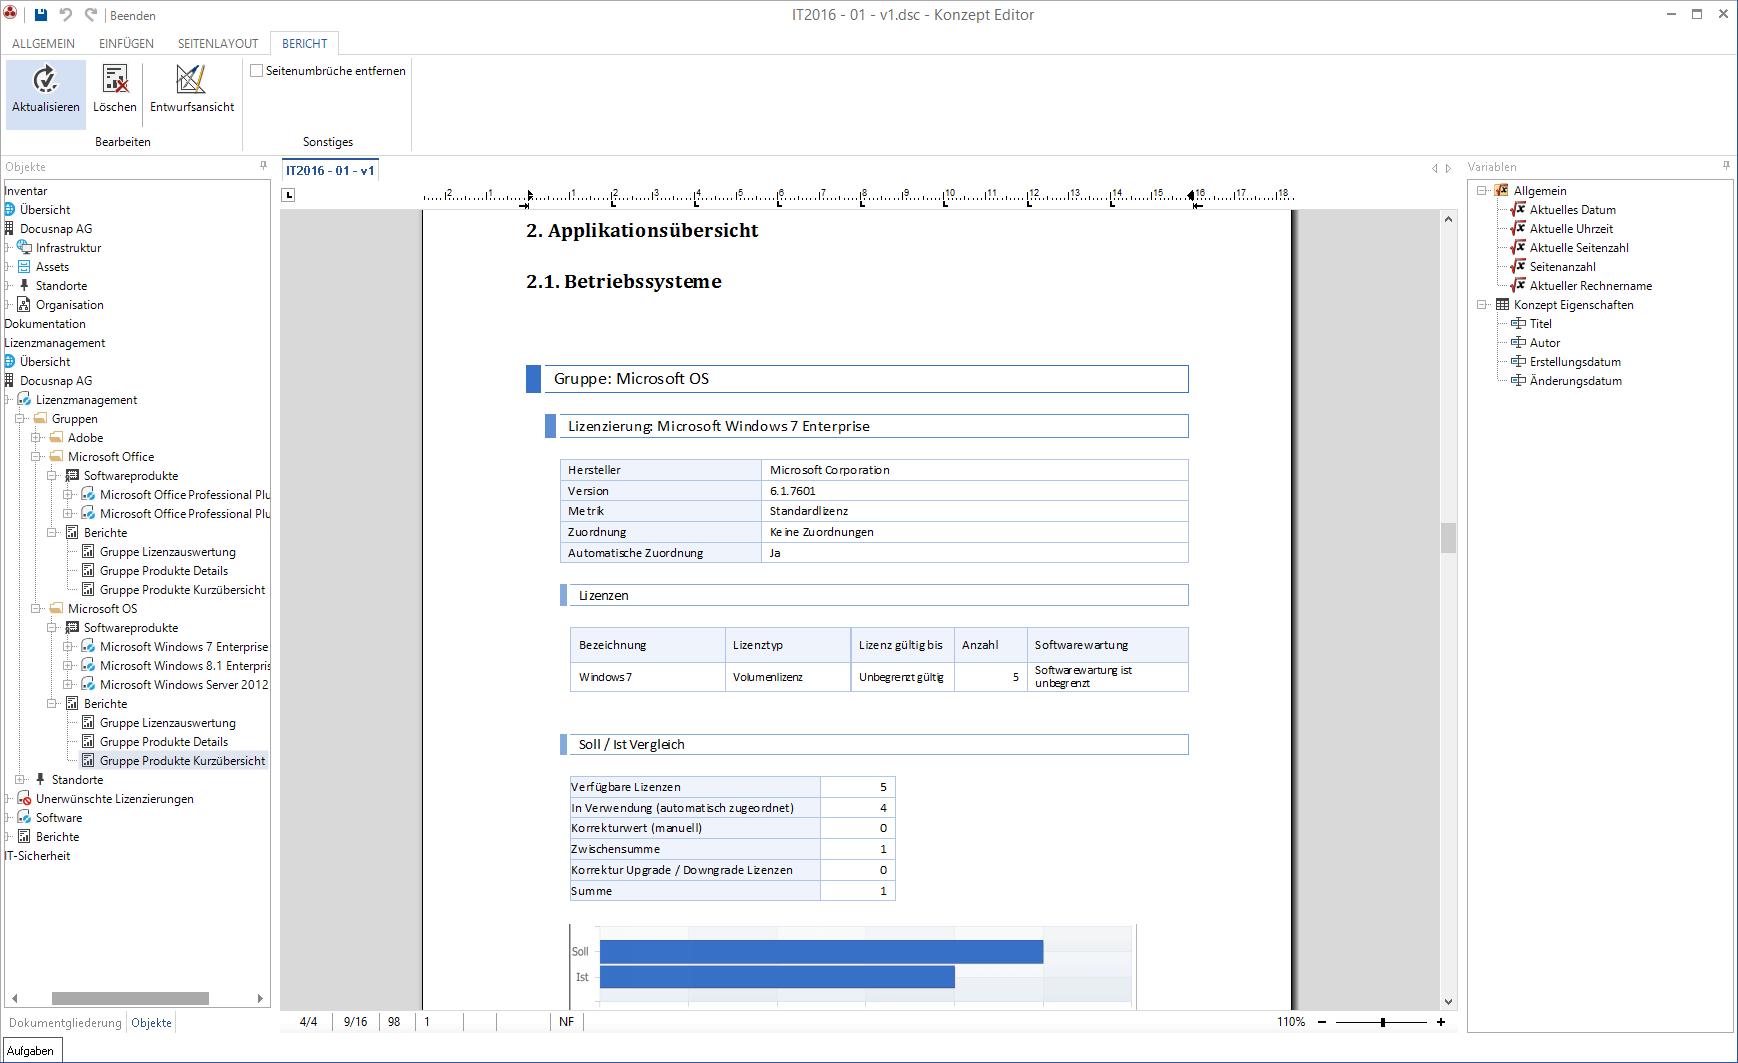 Screenshot: Bericht-Darstellung IT-Konzept